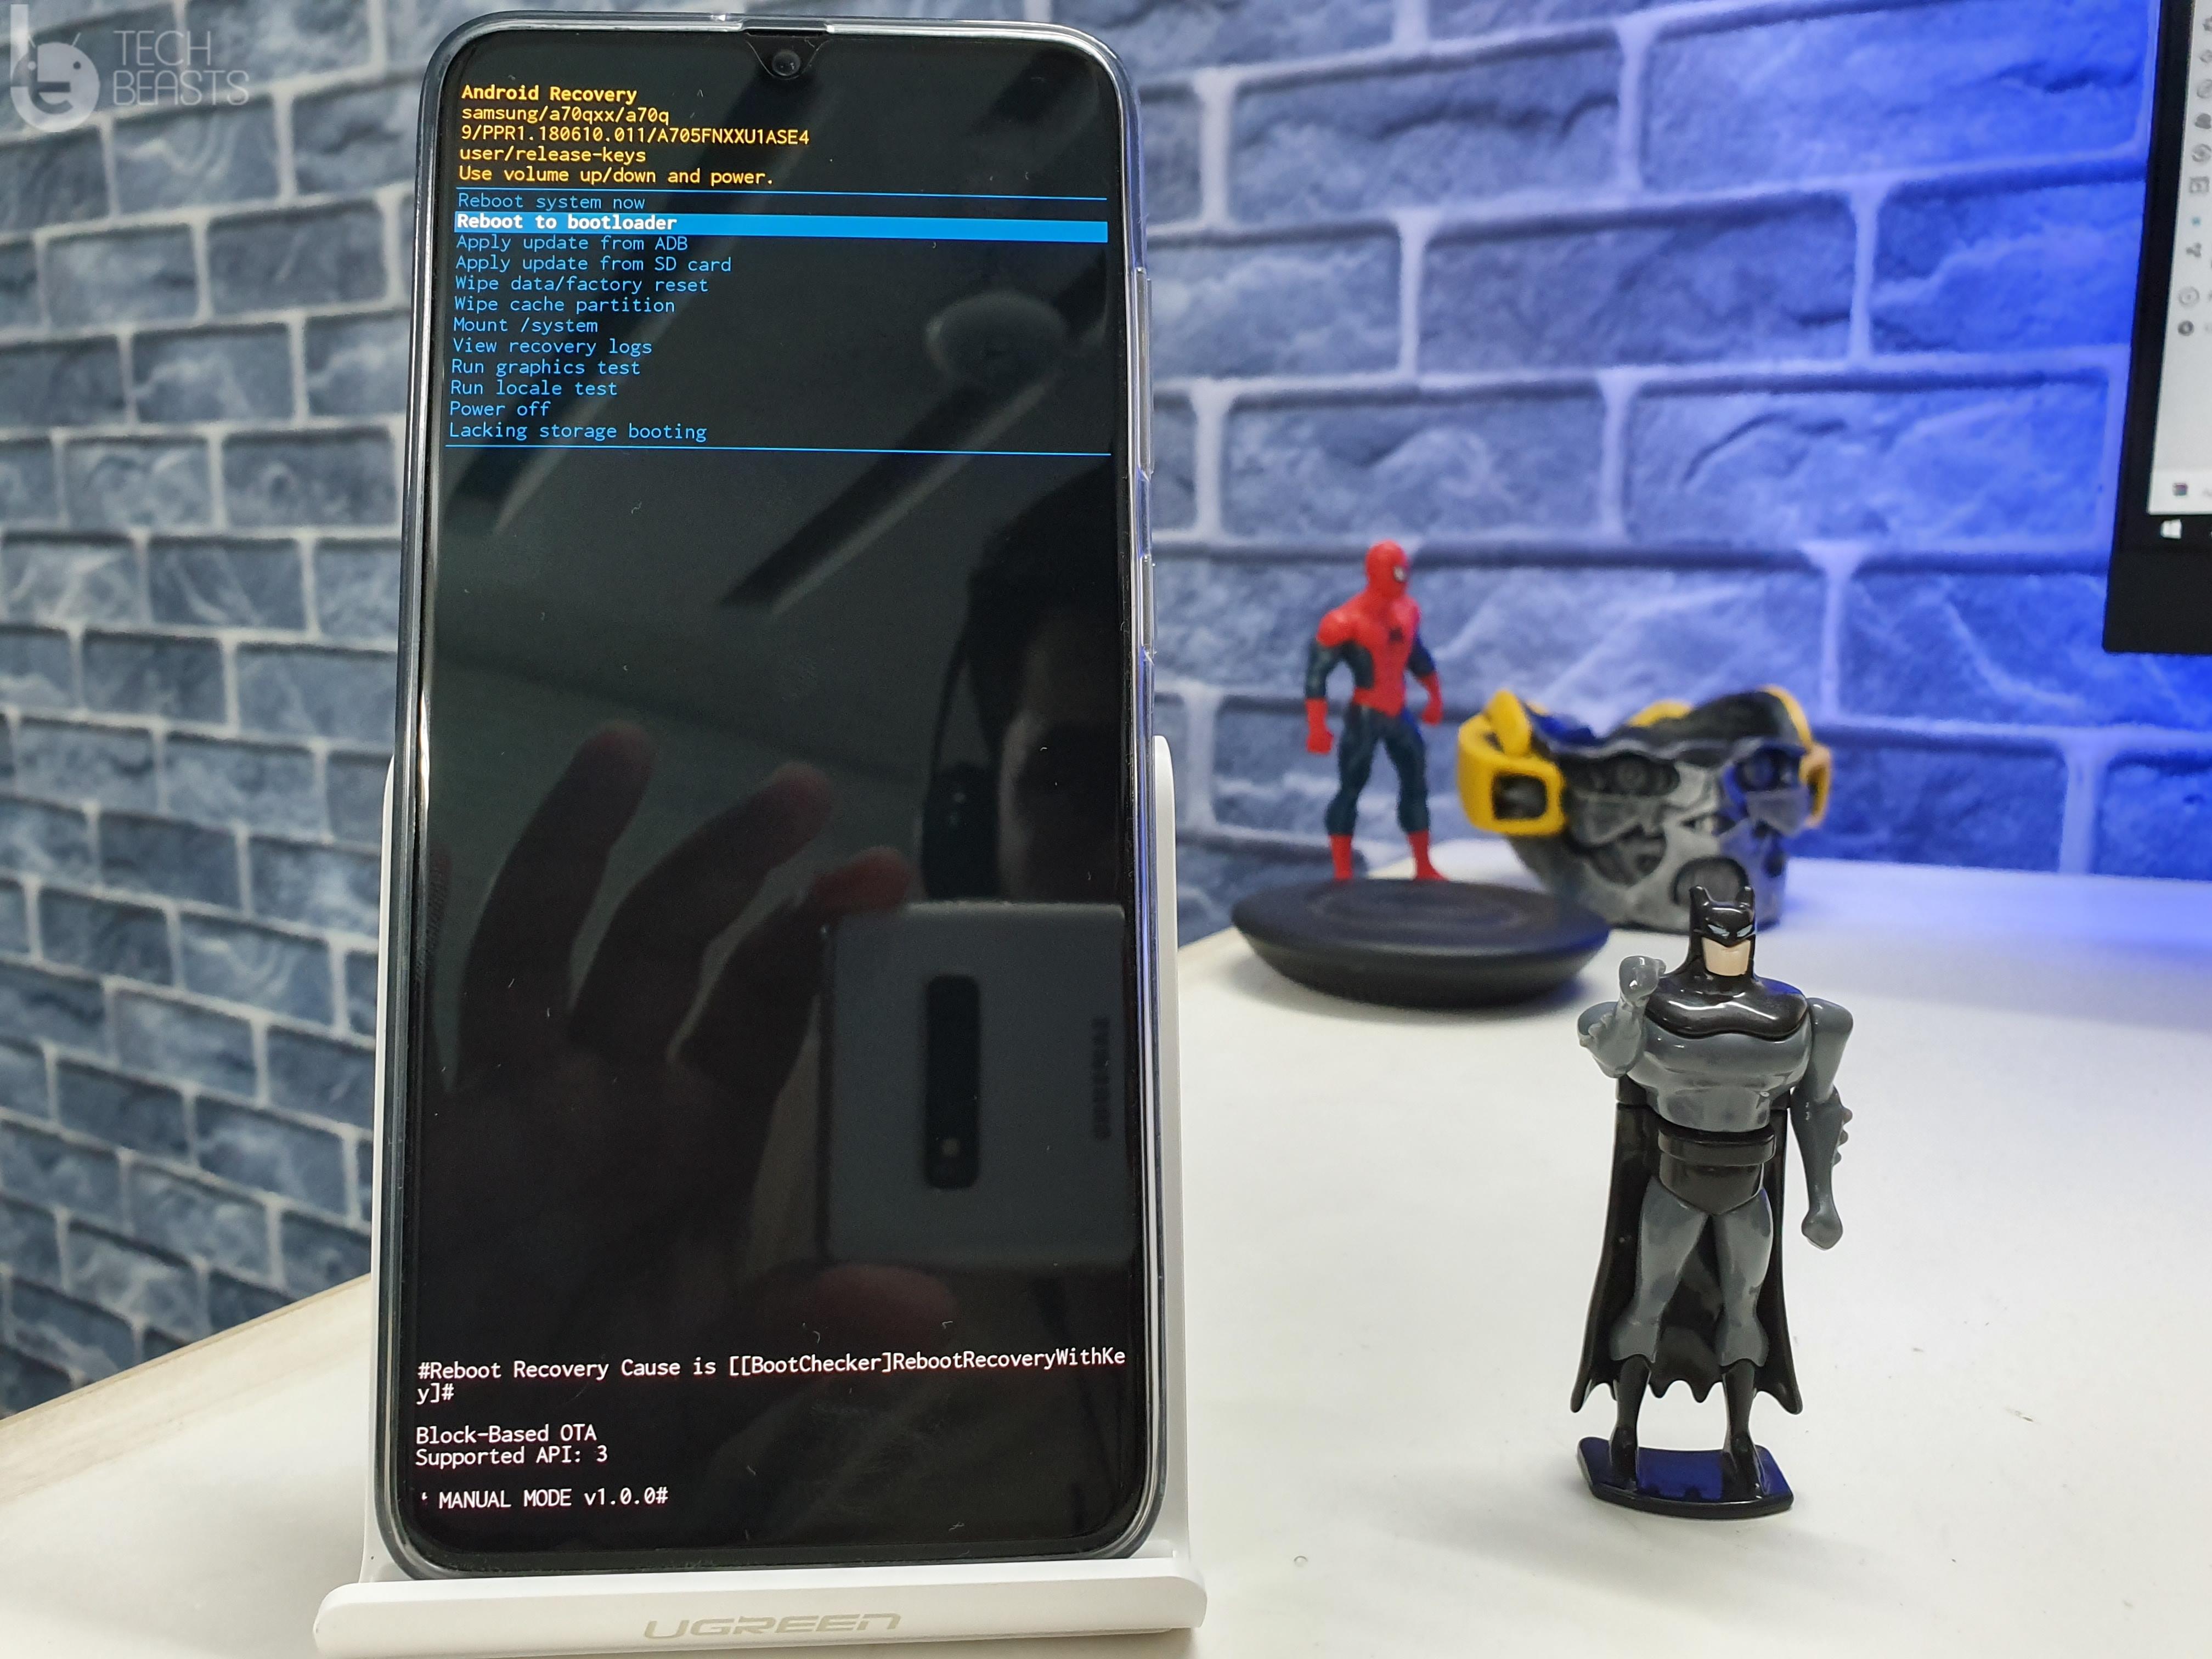 Galaxy A70 Recovery Mode